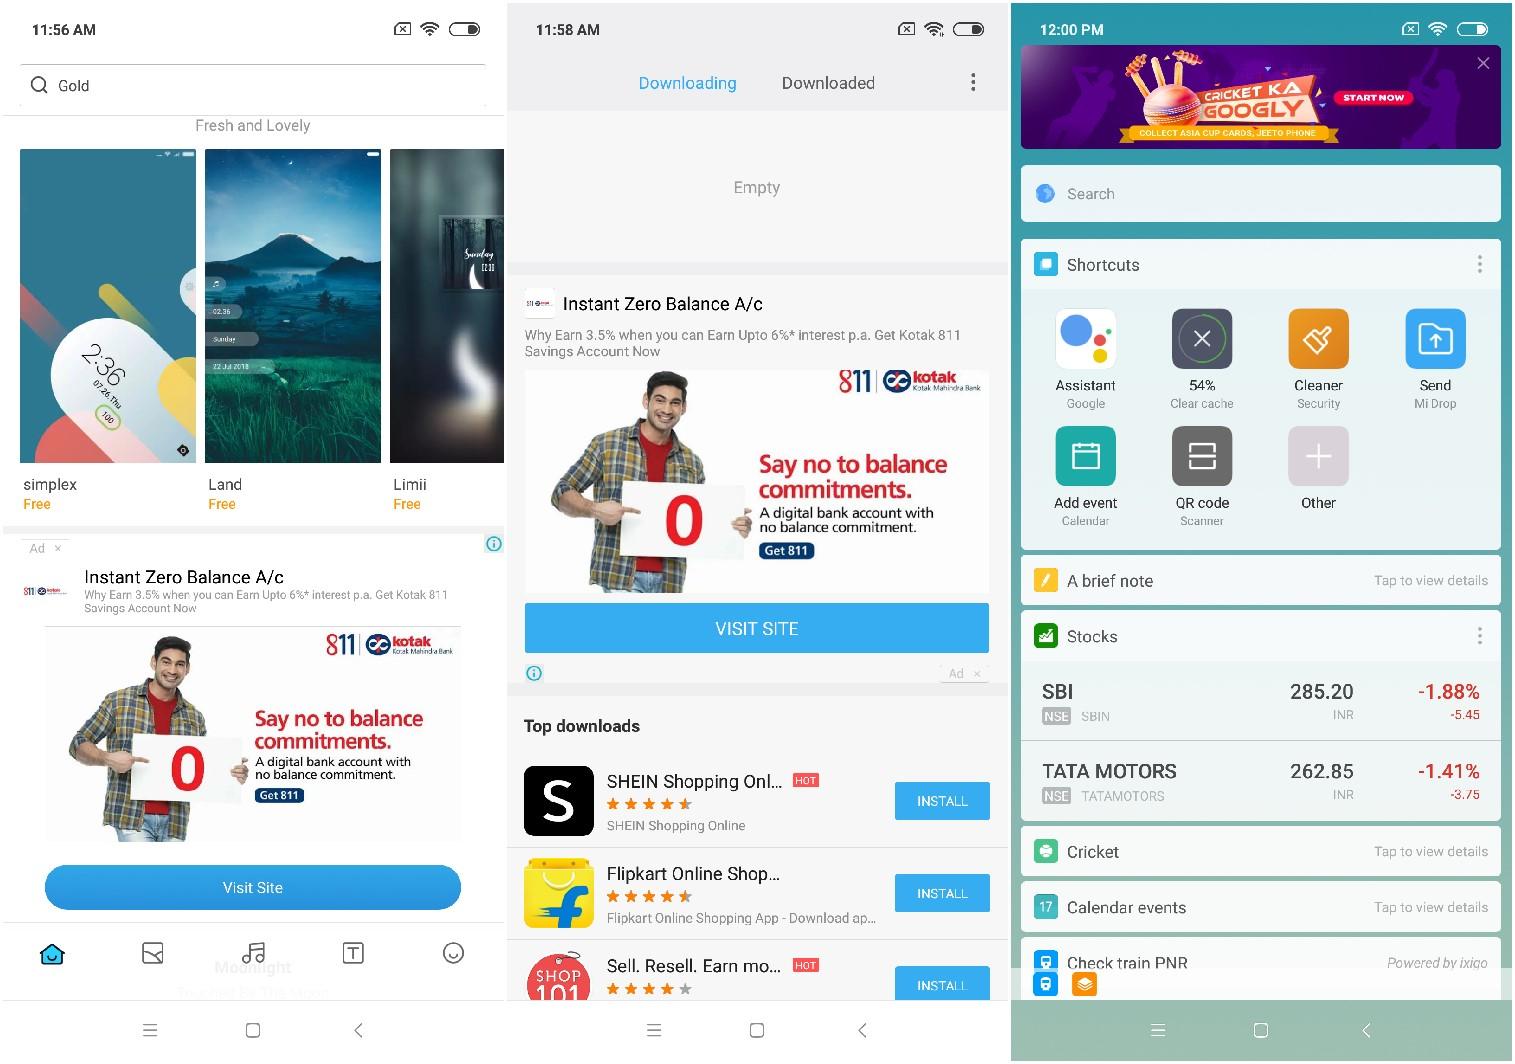 Xiaomi advertising in MIUI